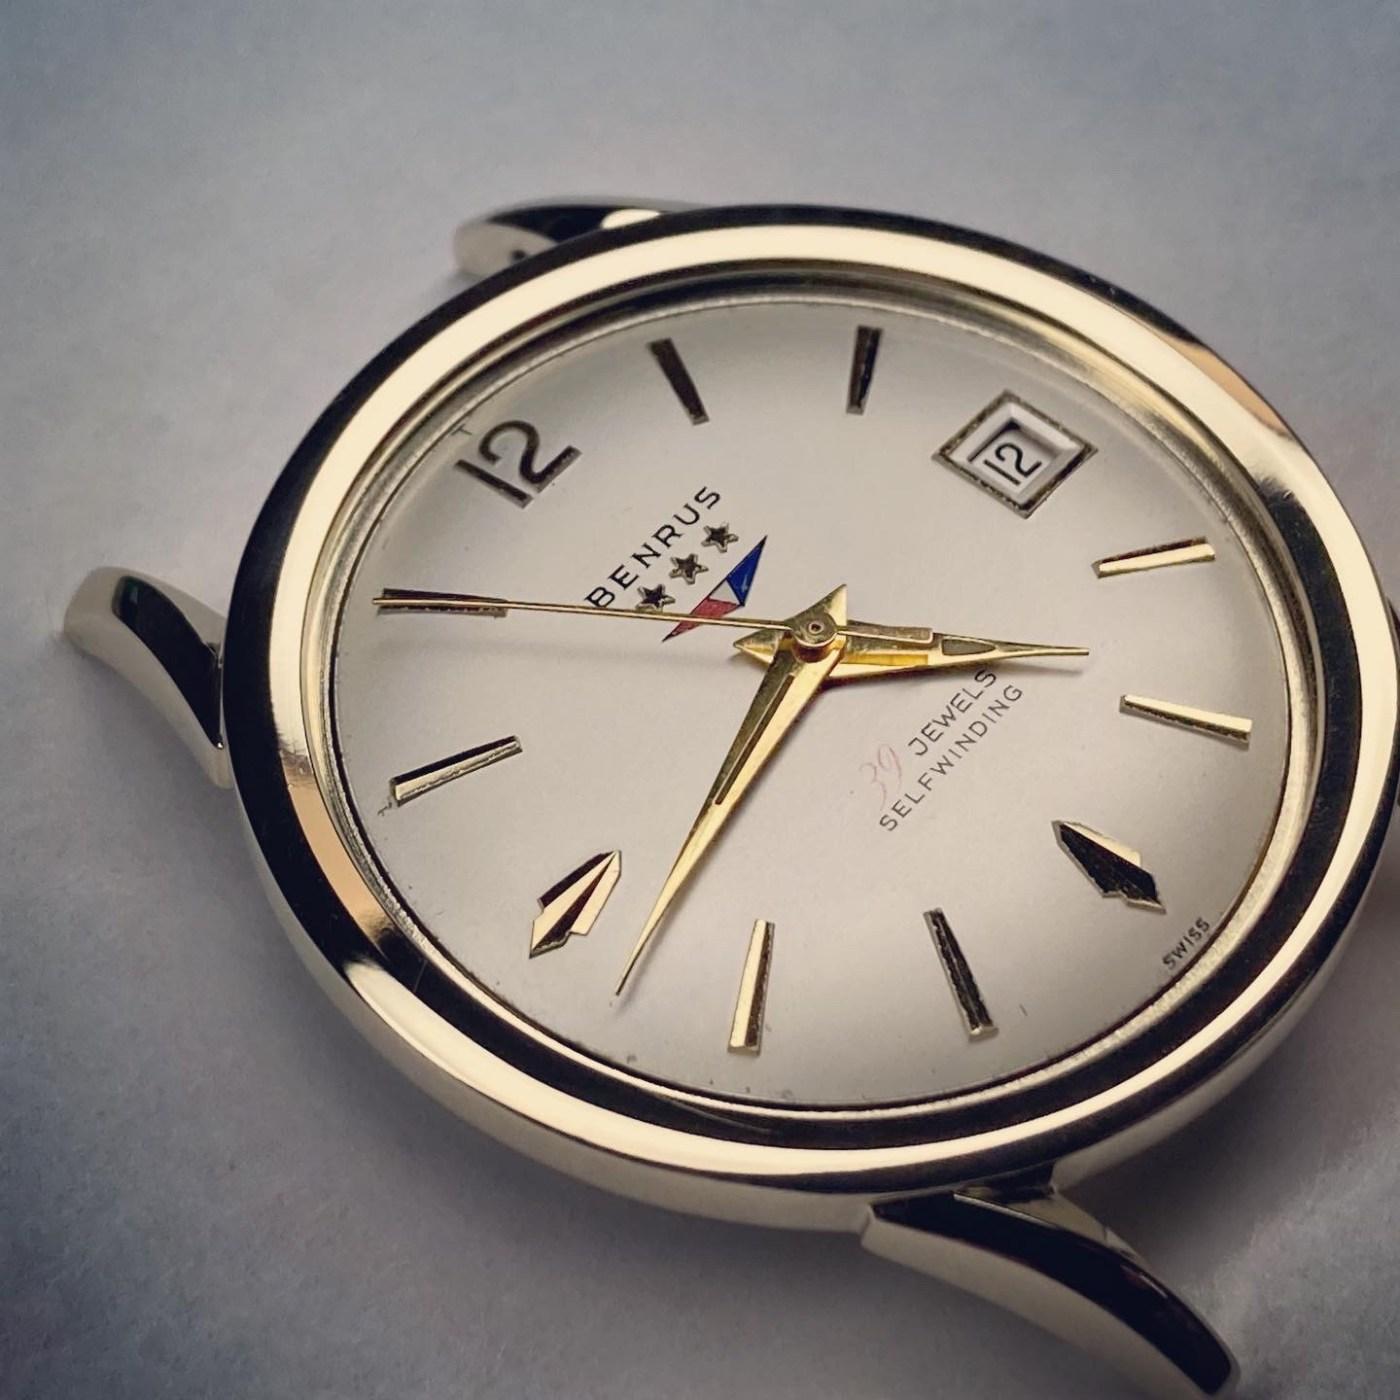 Vintage Benrus 39 Jewel watch head